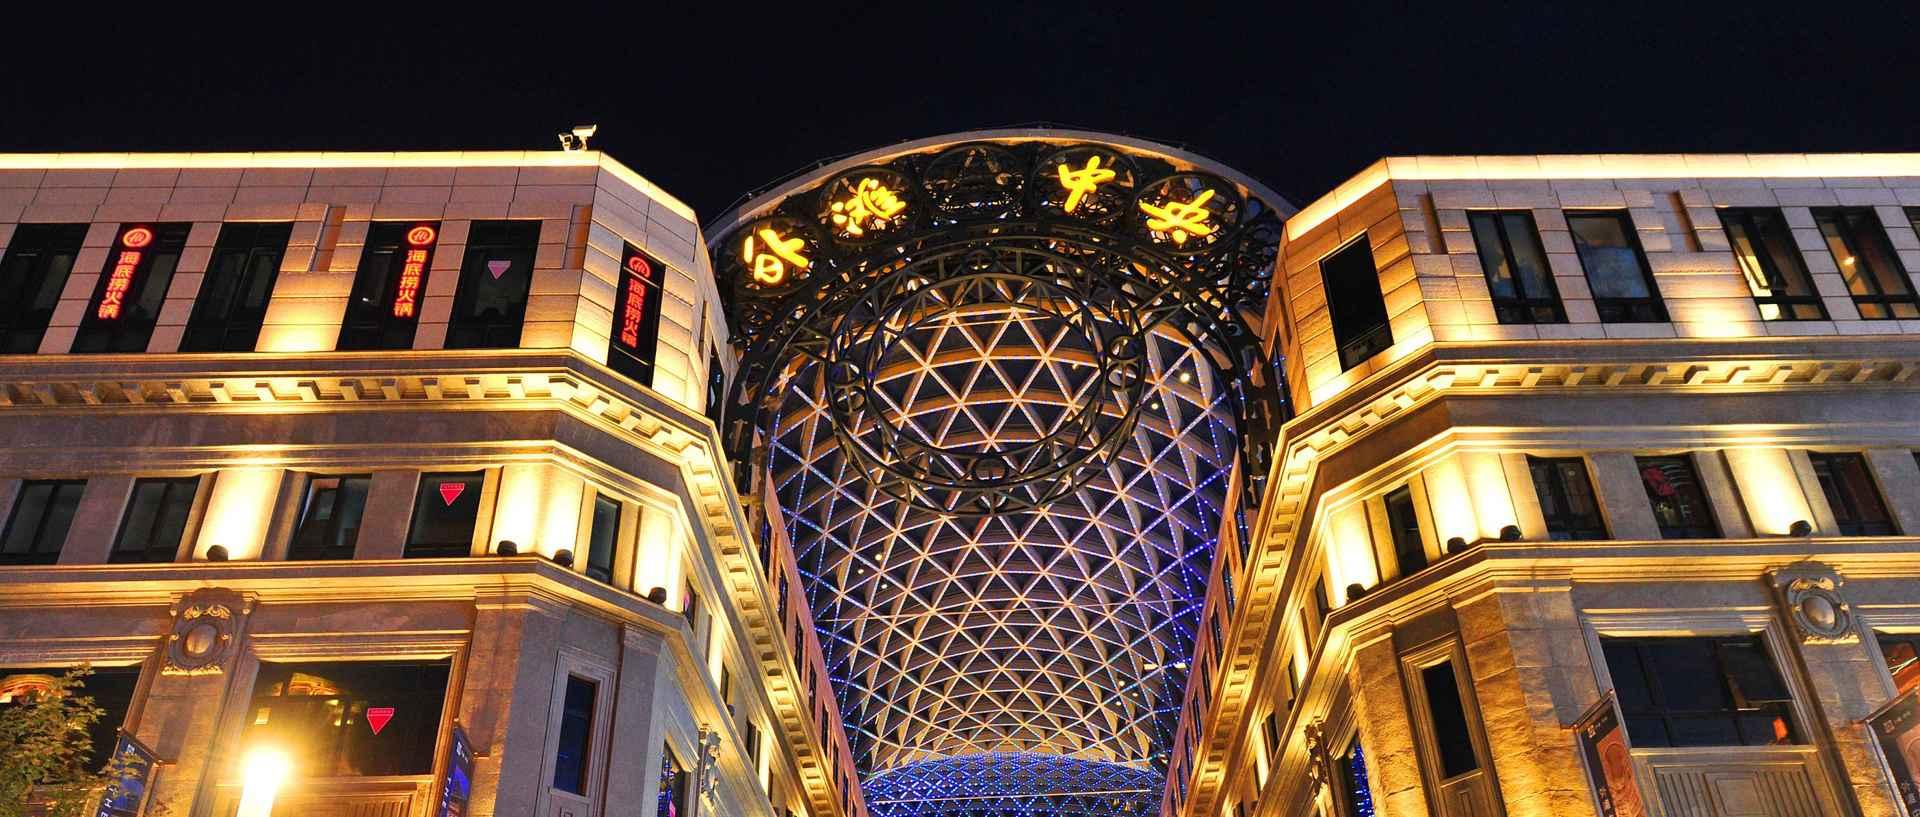 Stunning giant dome debuts on Nanjing Road